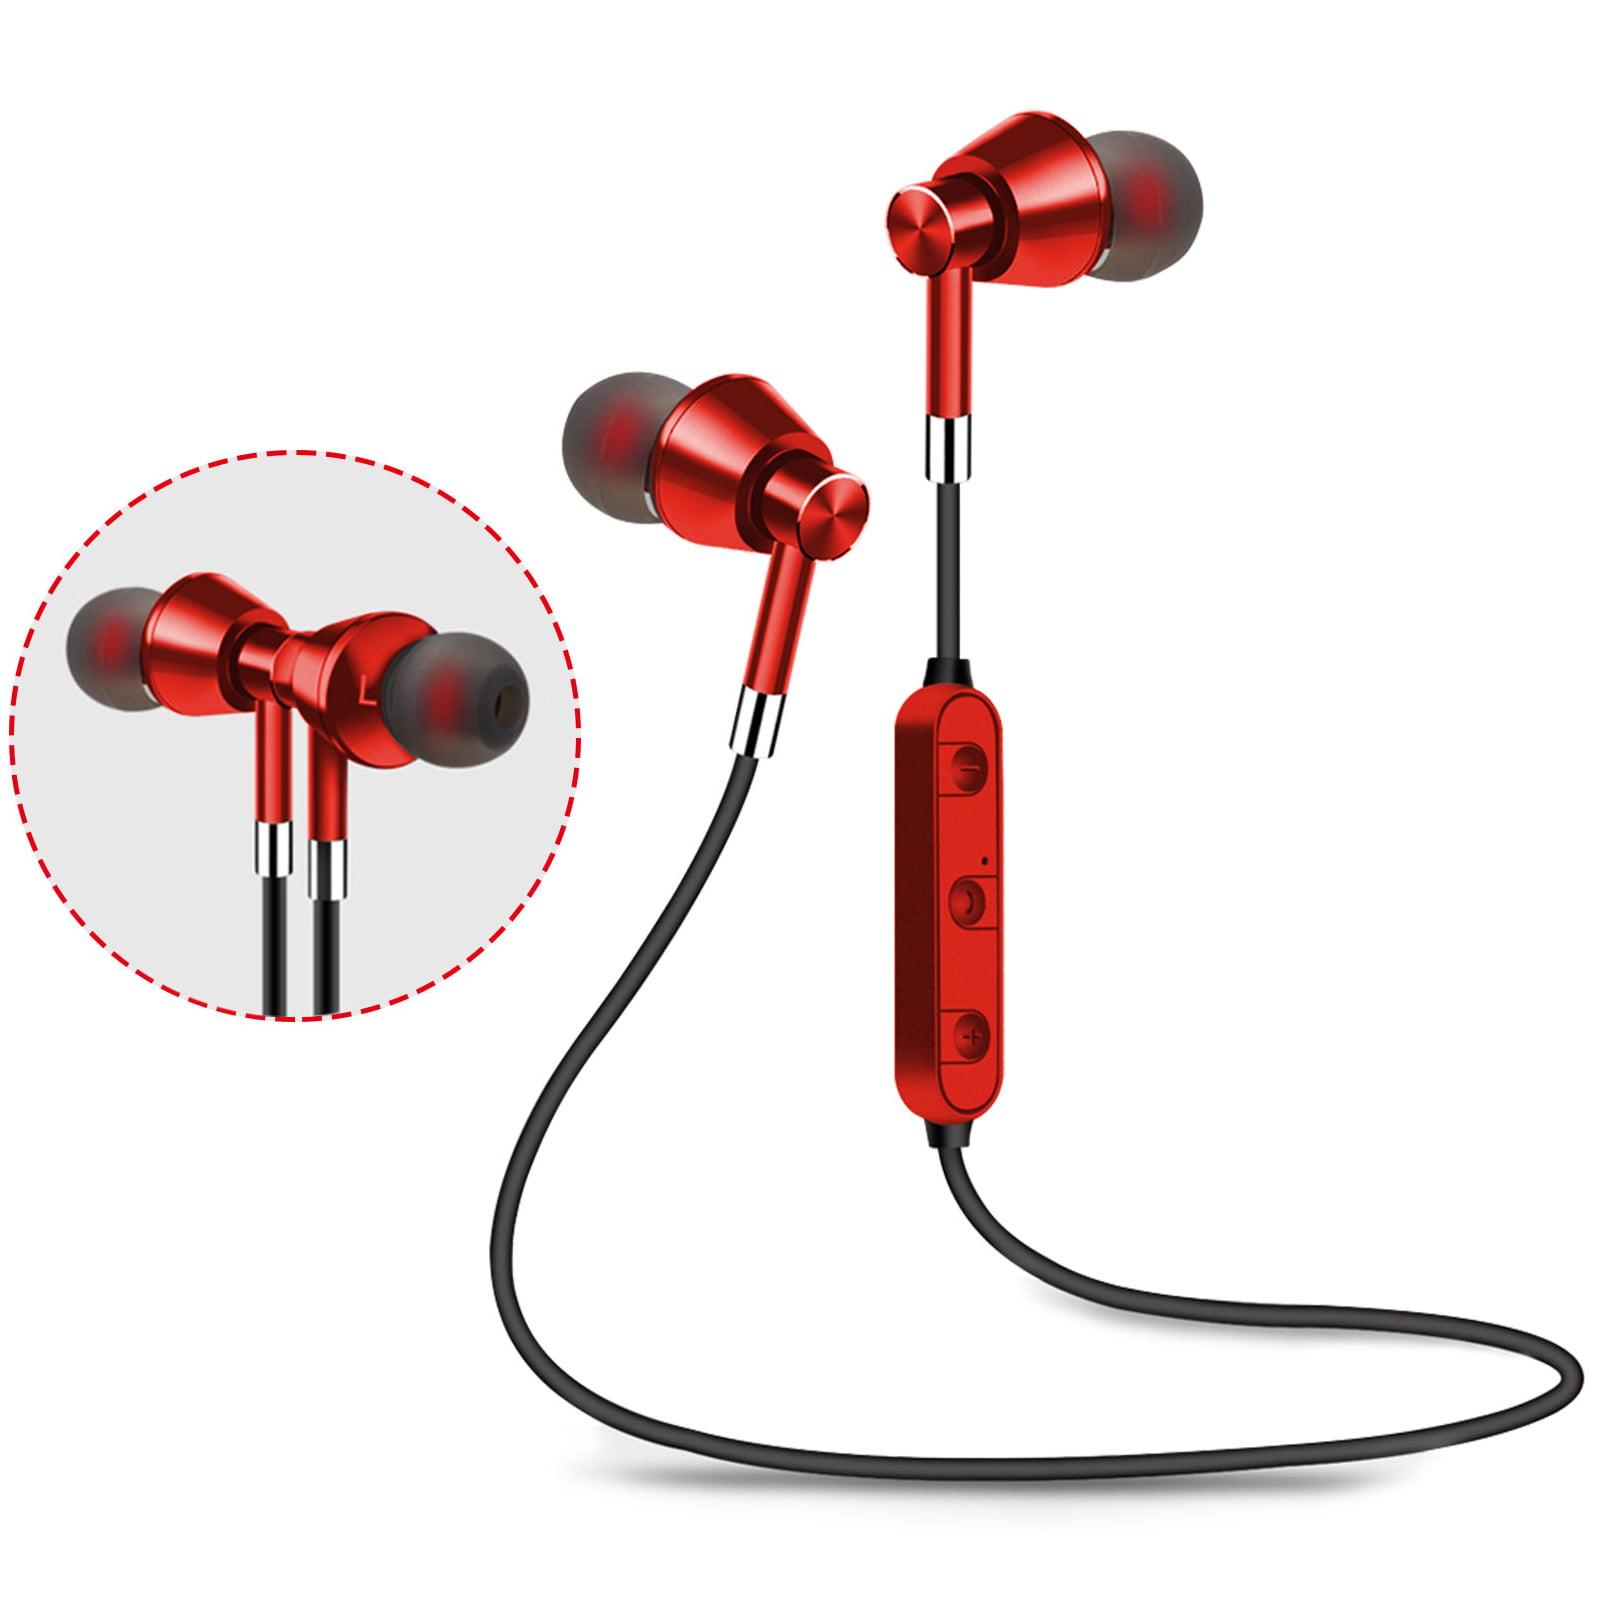 EEEKit Wireless Bluetooth Magnetic Earphones, Sweatproof Sport Earbuds with Data Cable, Waterproof Lightweight Gym Headset with Built-in Mic